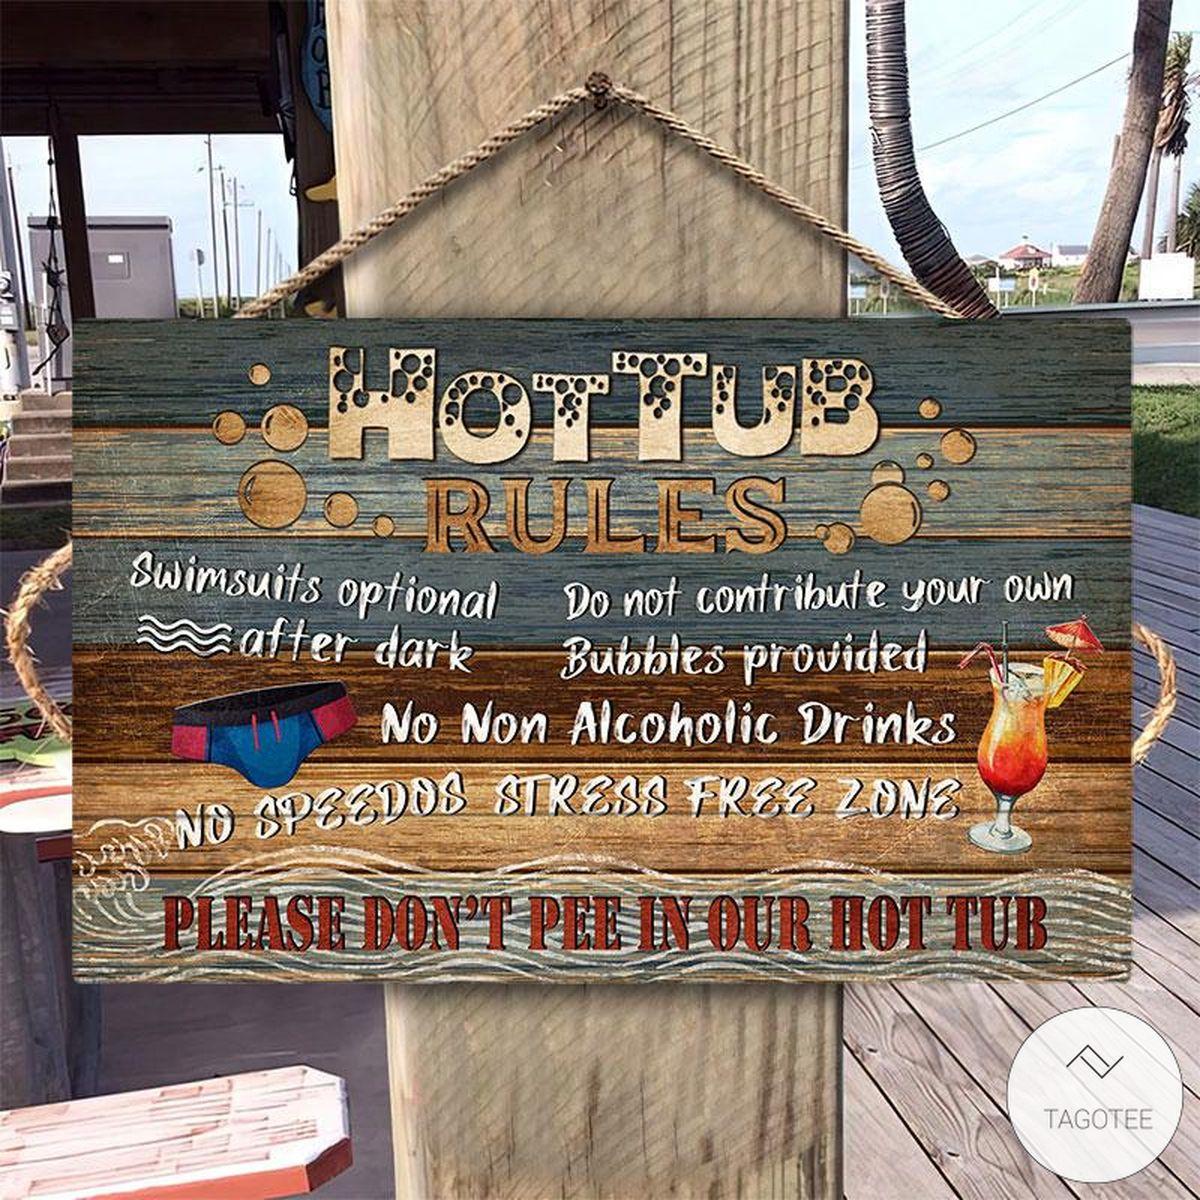 Hot Tub Rules Rectangle Wood Sign